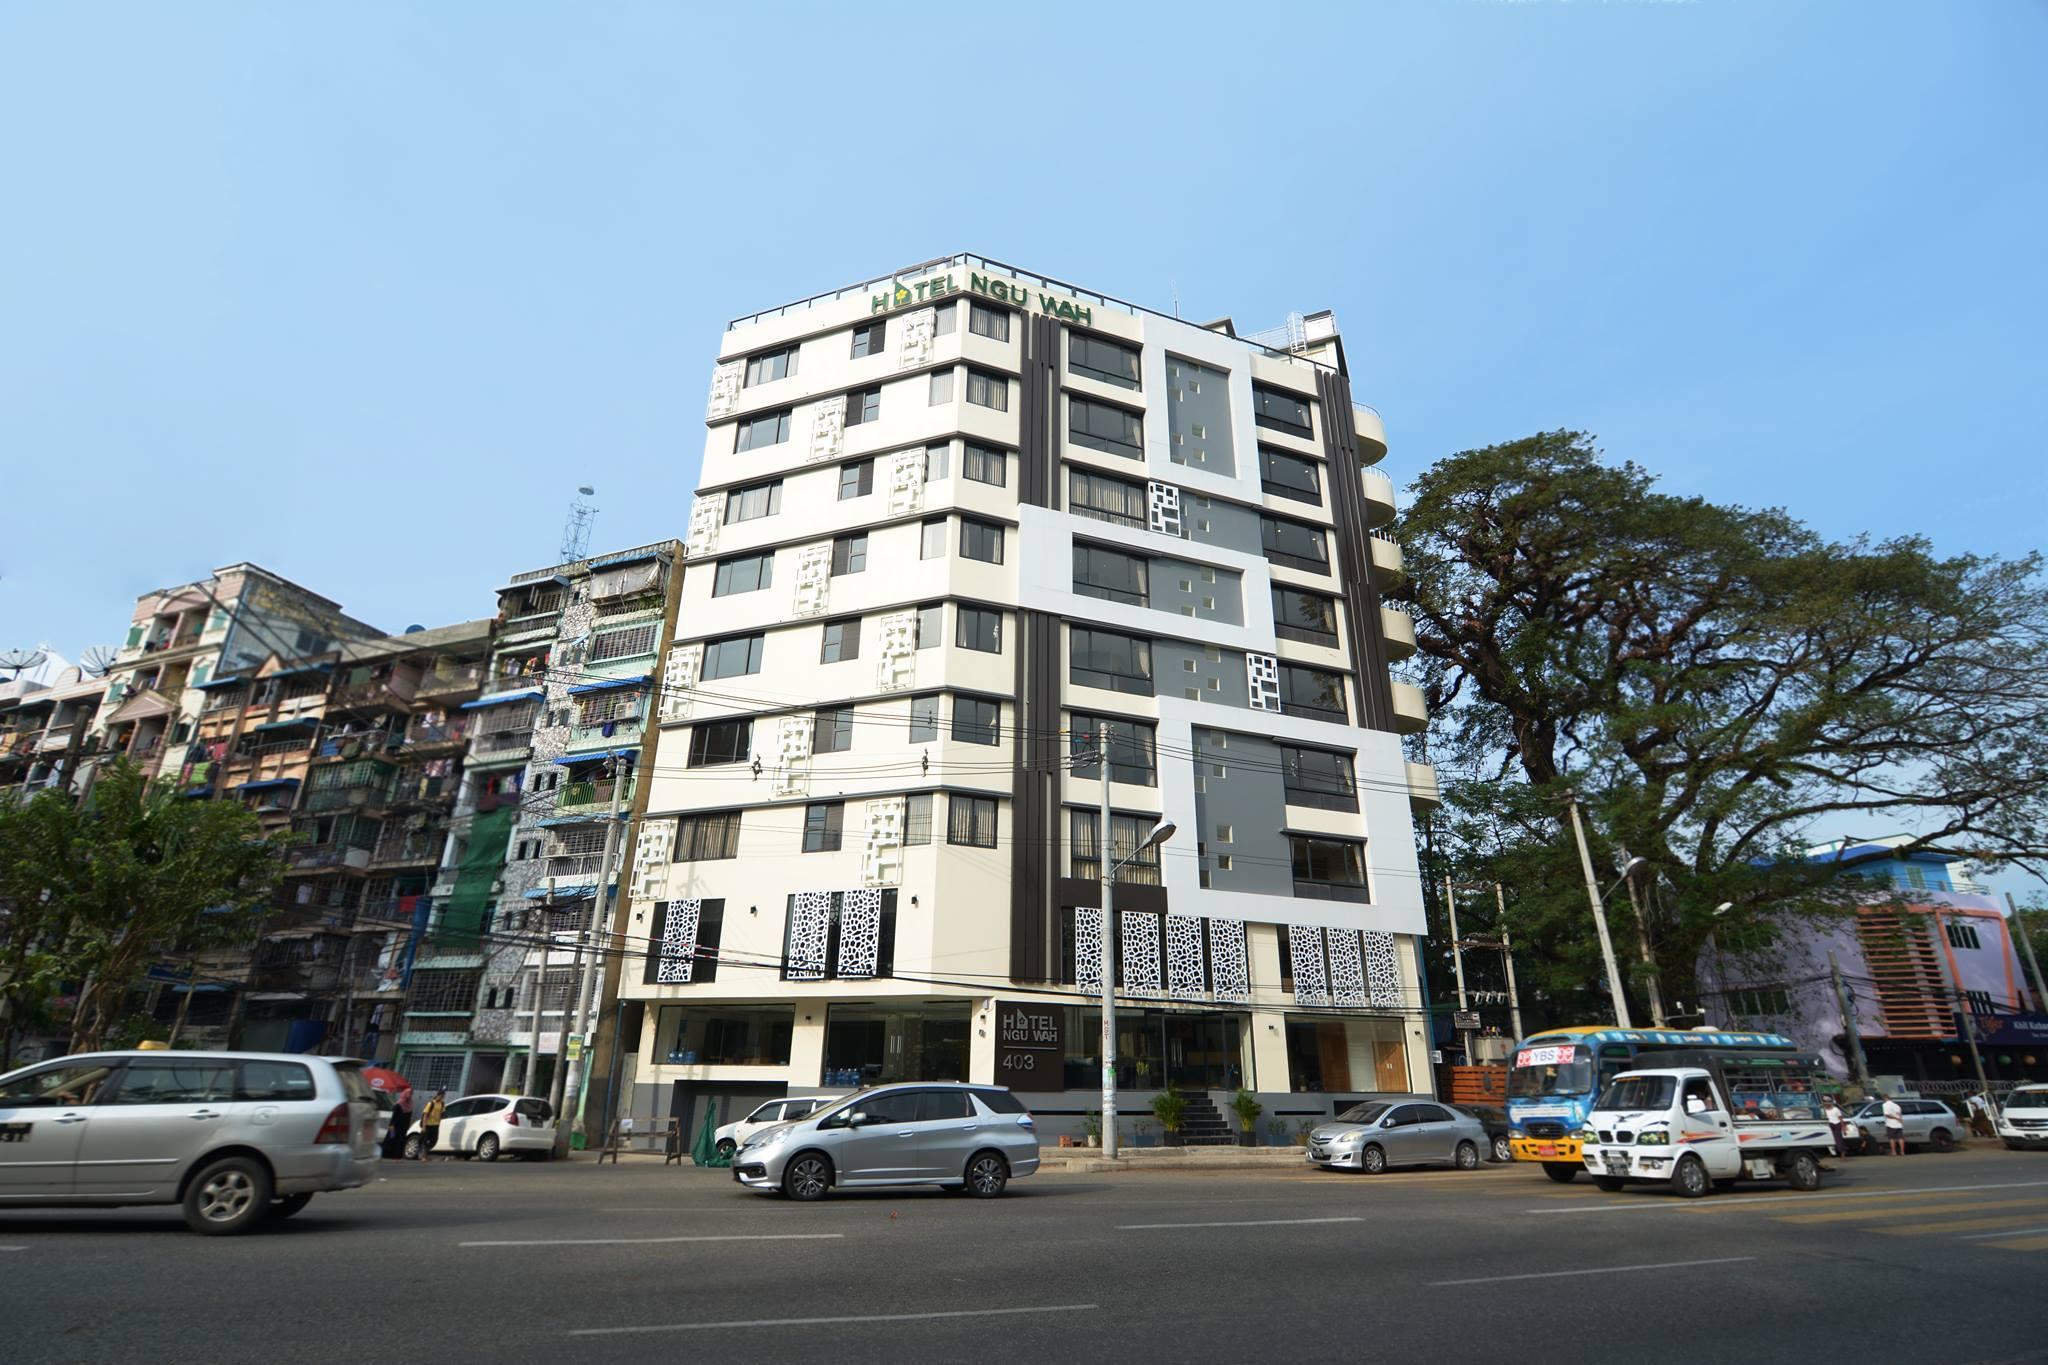 Hotel Ngu Wah